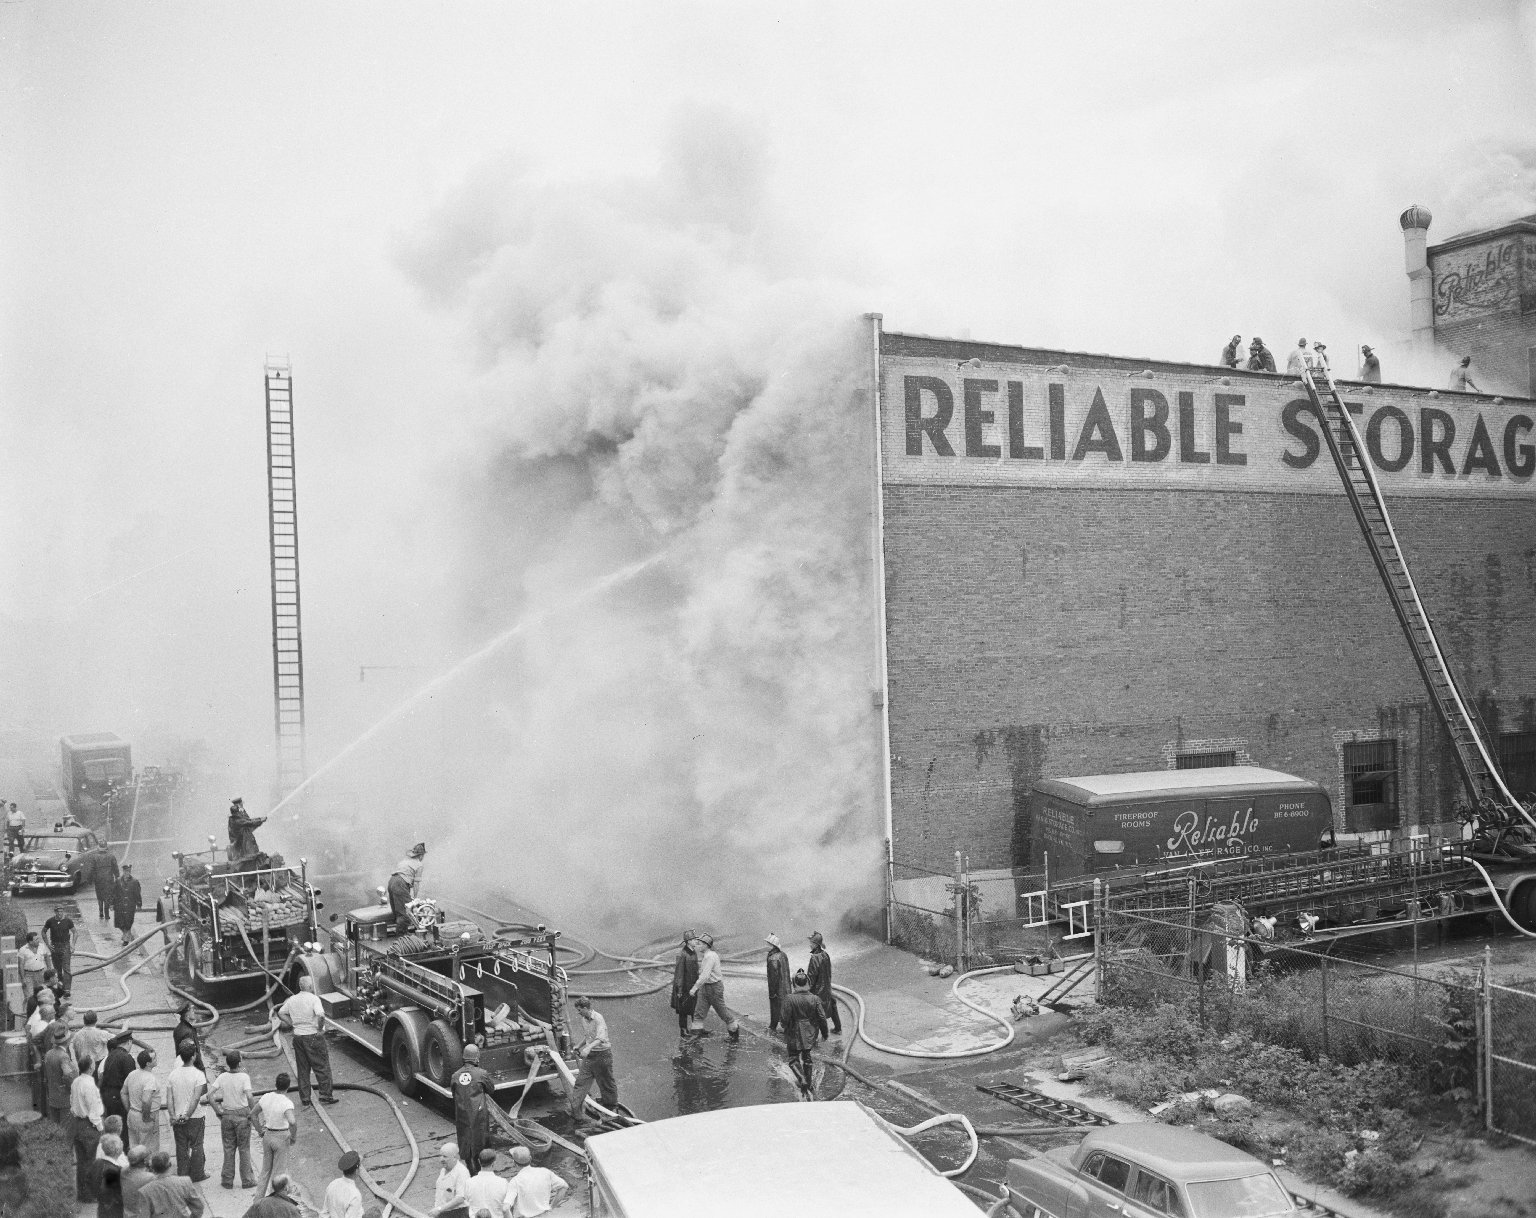 Пожар на складе. Нью-Йорк, США. 1950-е